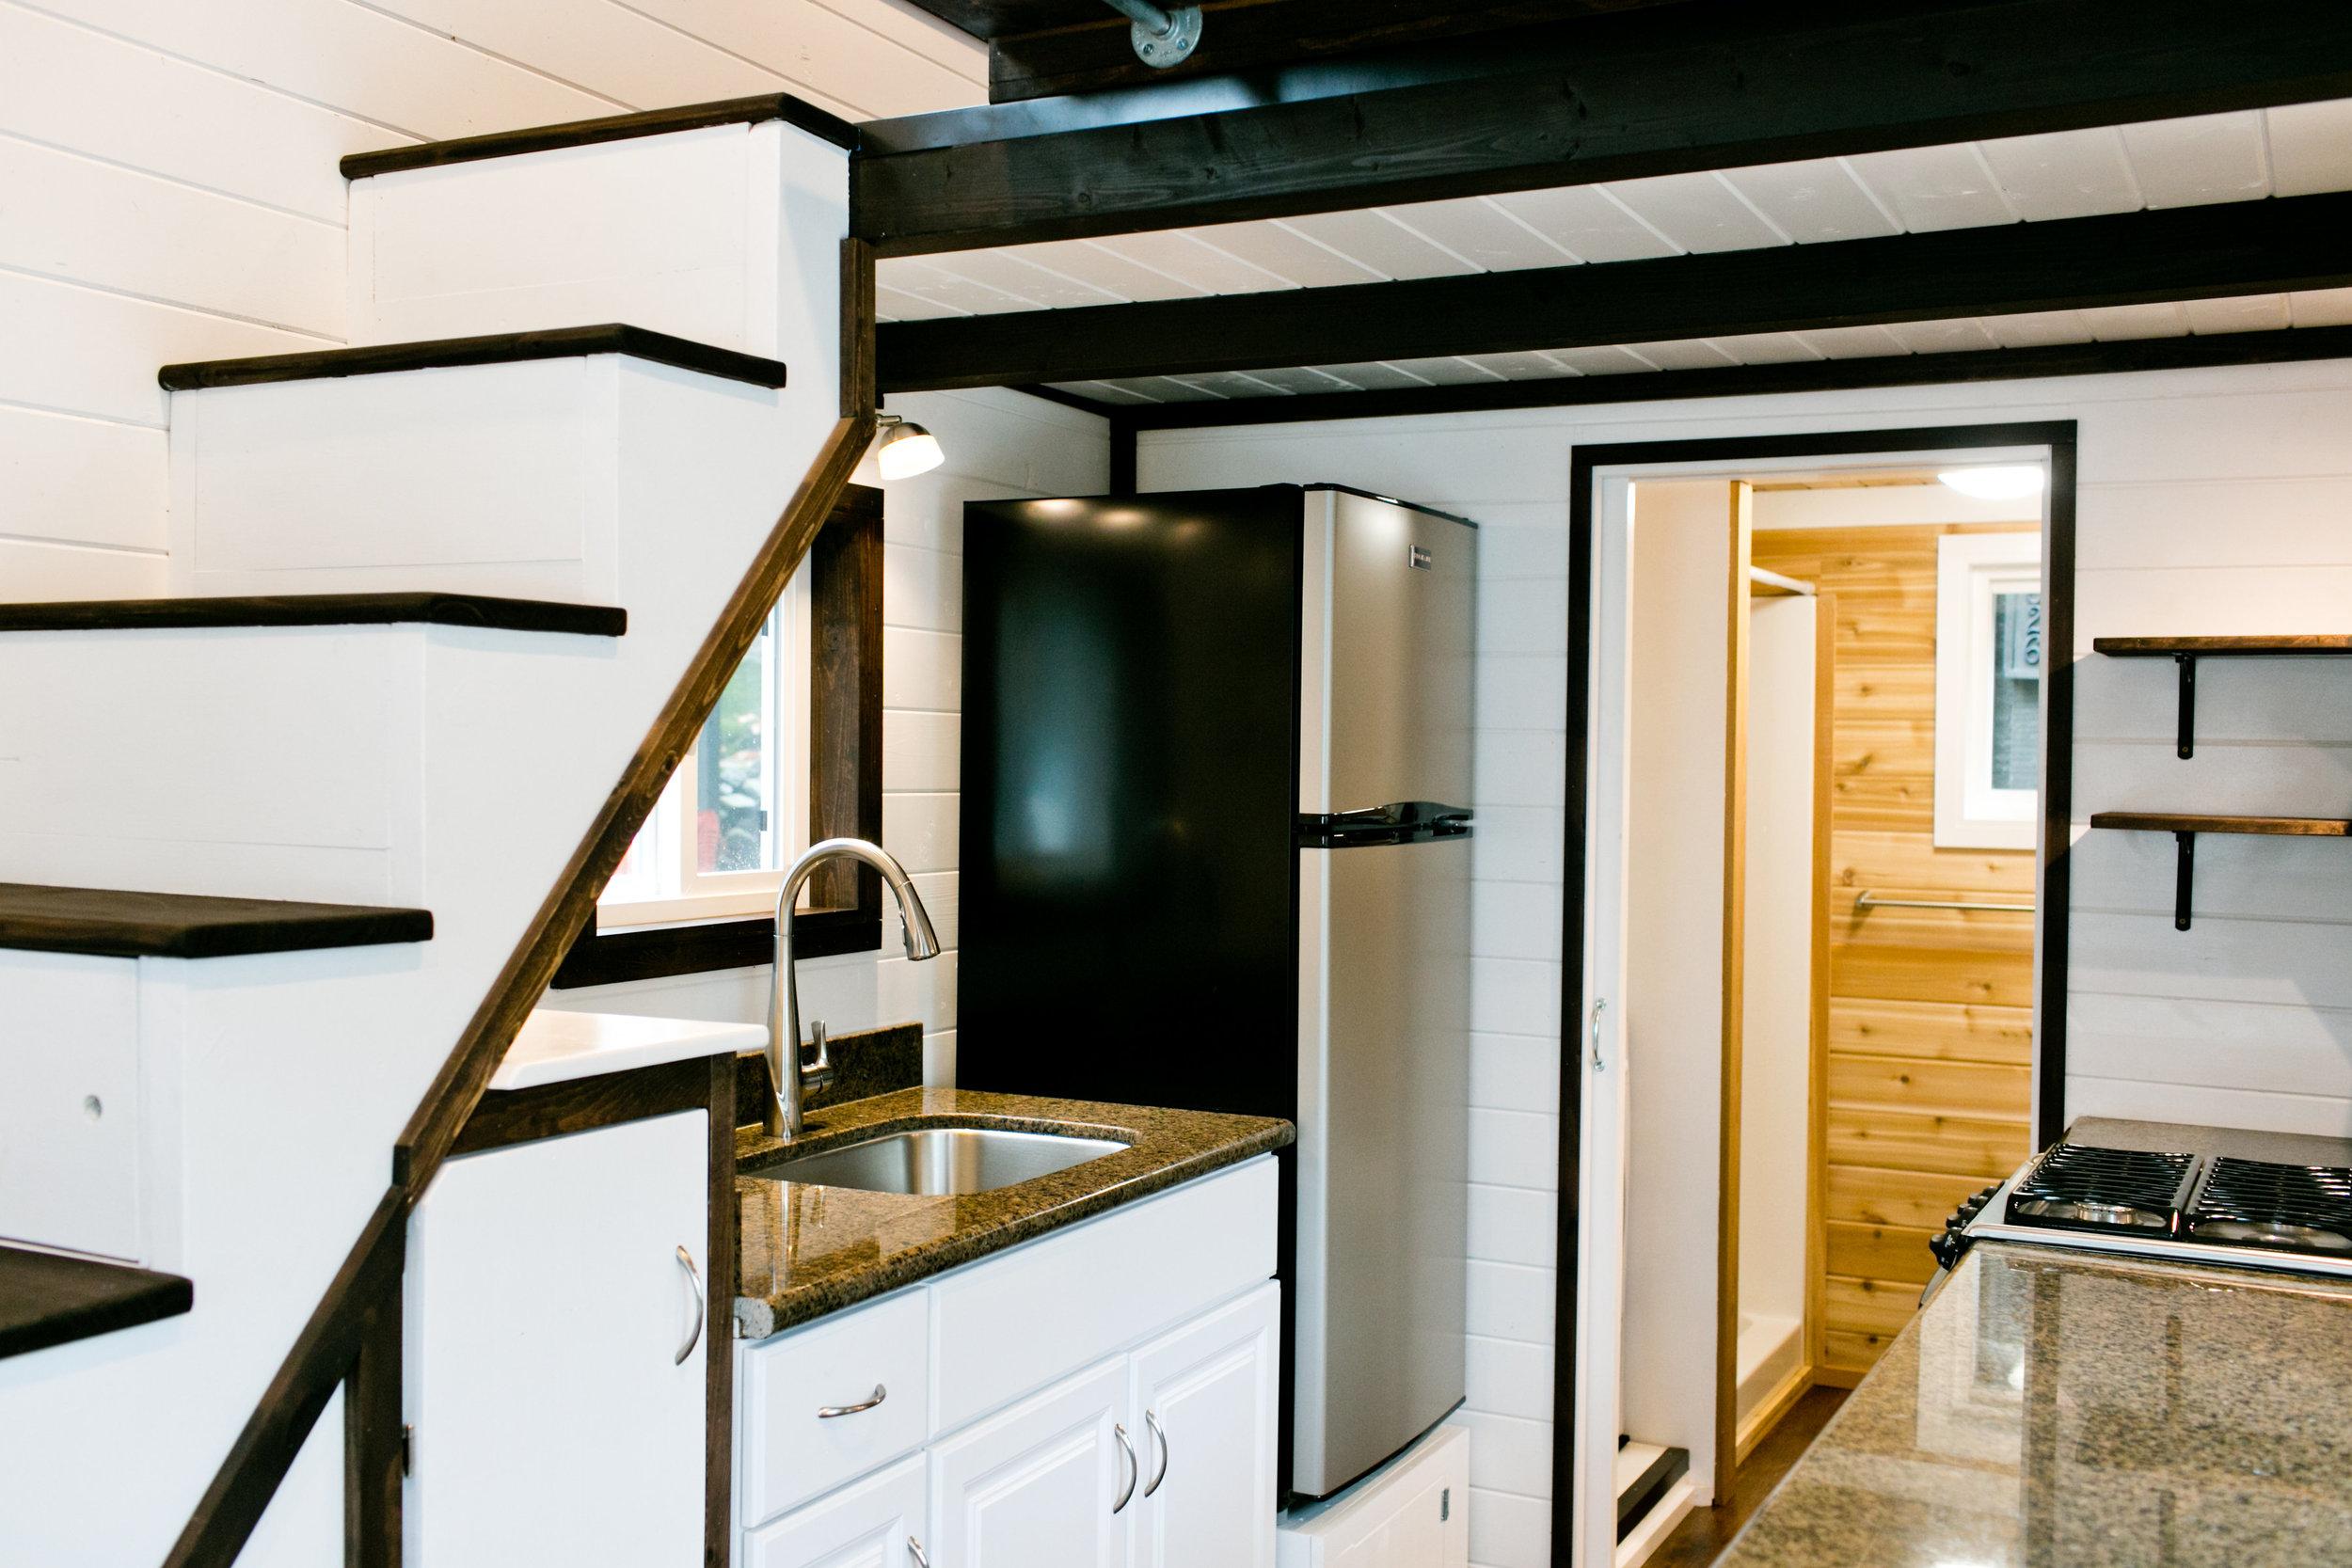 10 cubic foot stainless fridge/freezer